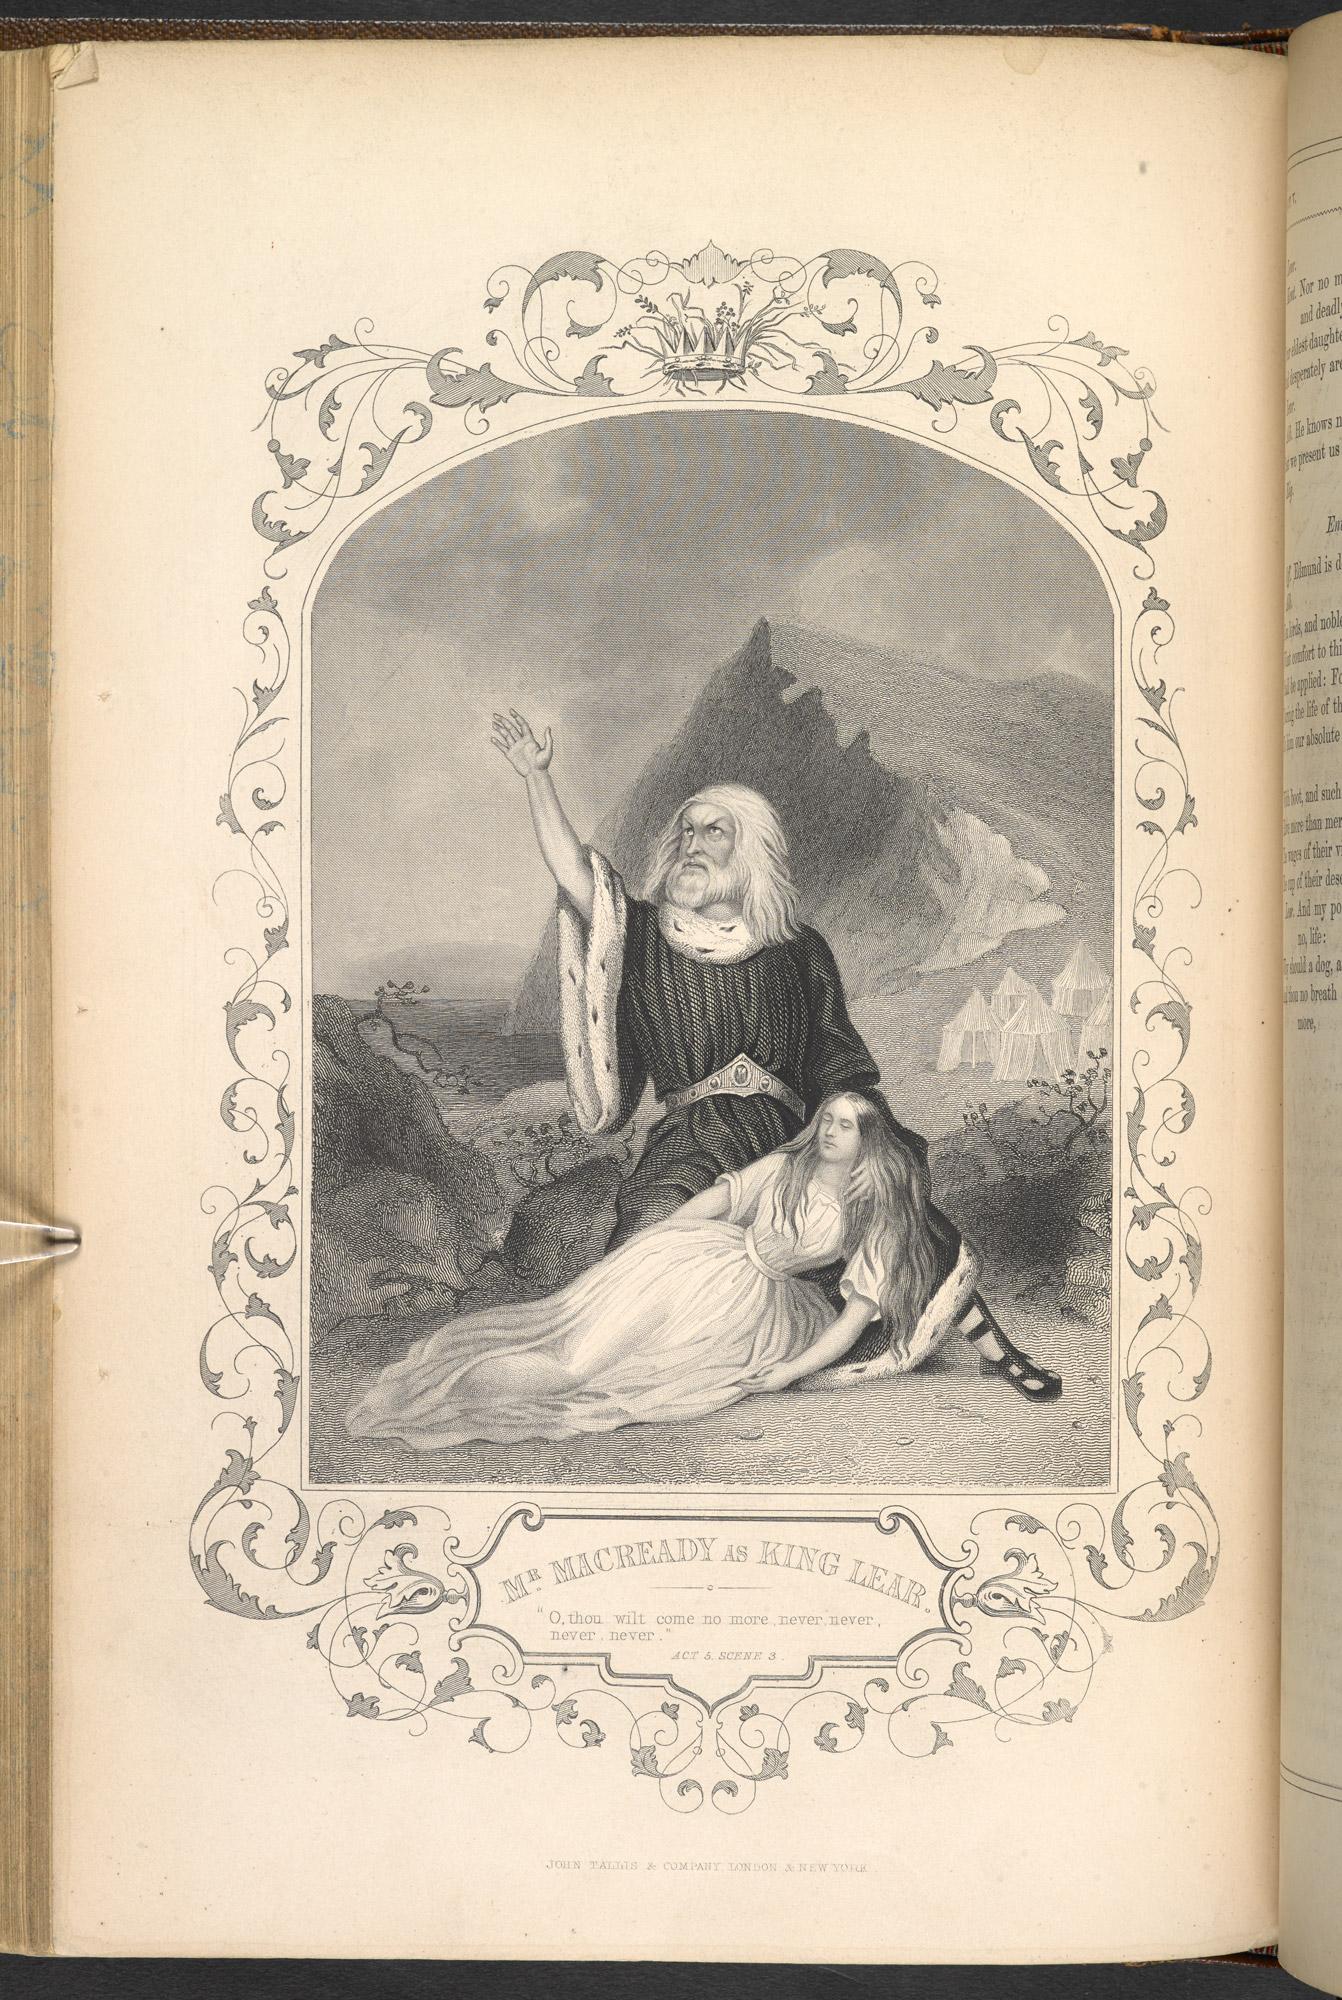 Engraving of Charles Macready as King Lear